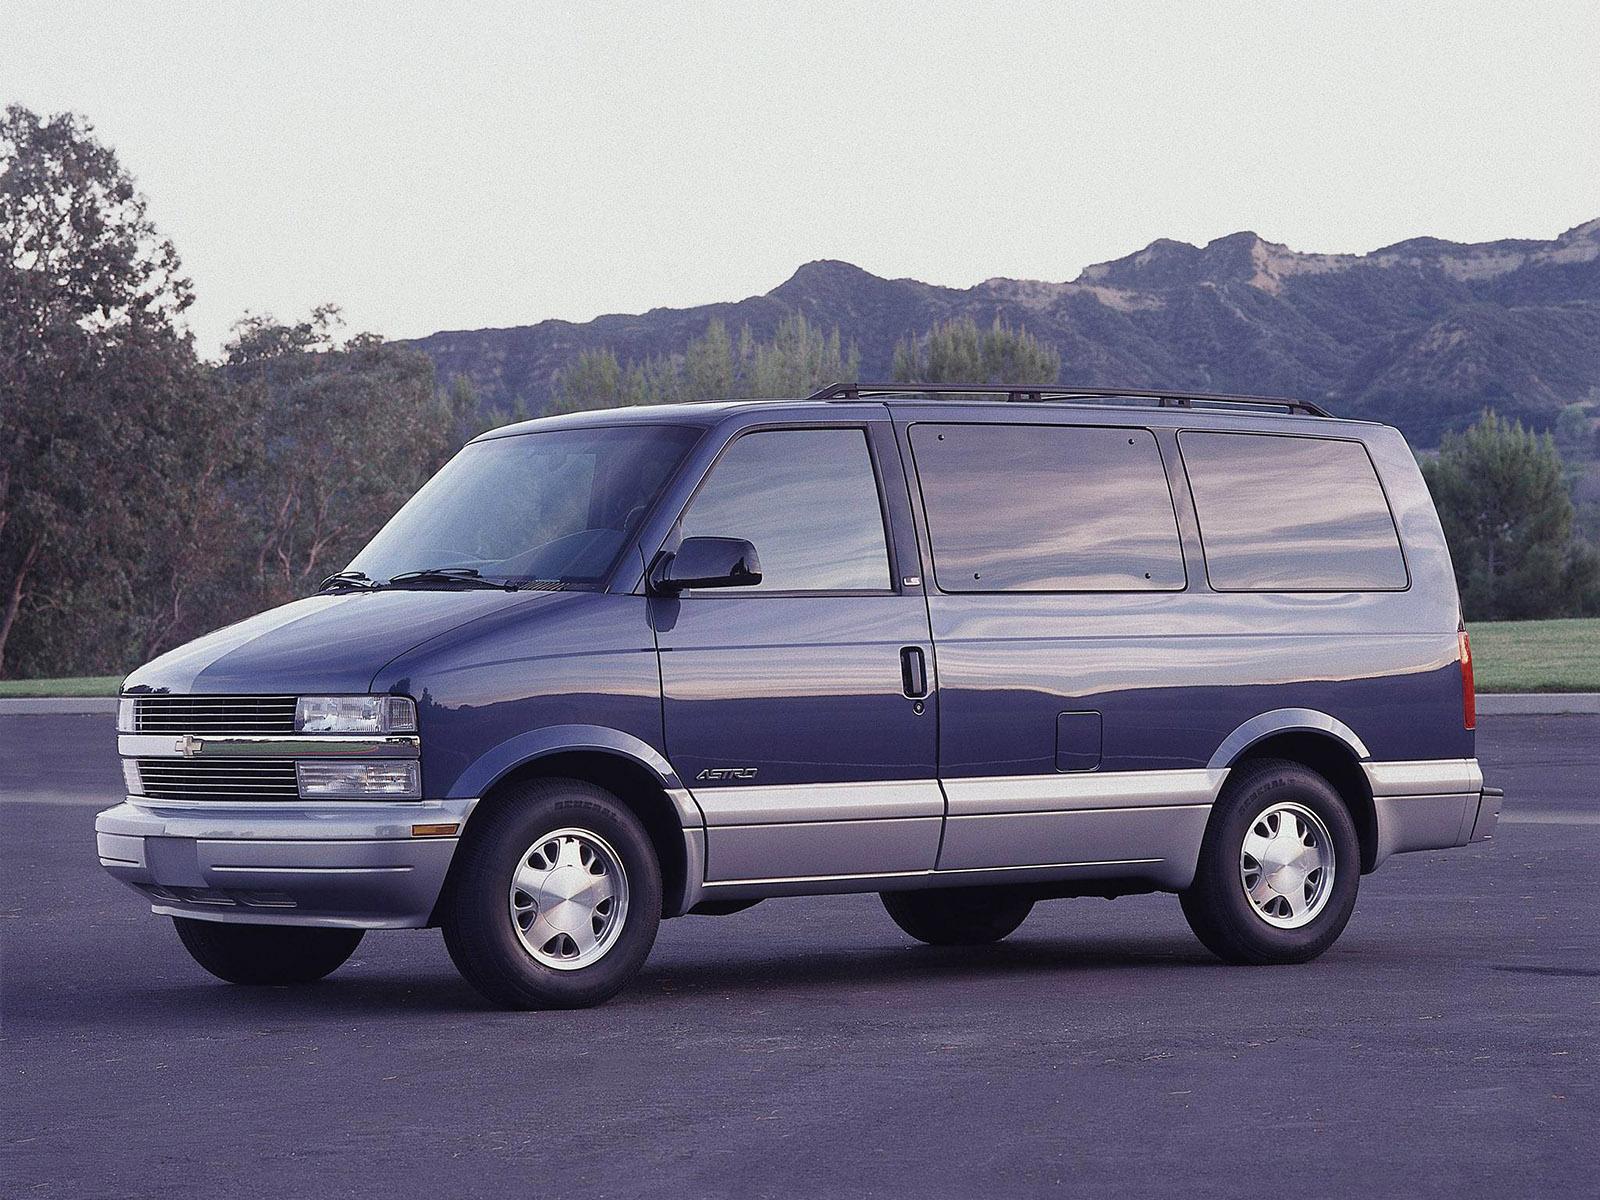 image gallery new chevy astro van. Black Bedroom Furniture Sets. Home Design Ideas